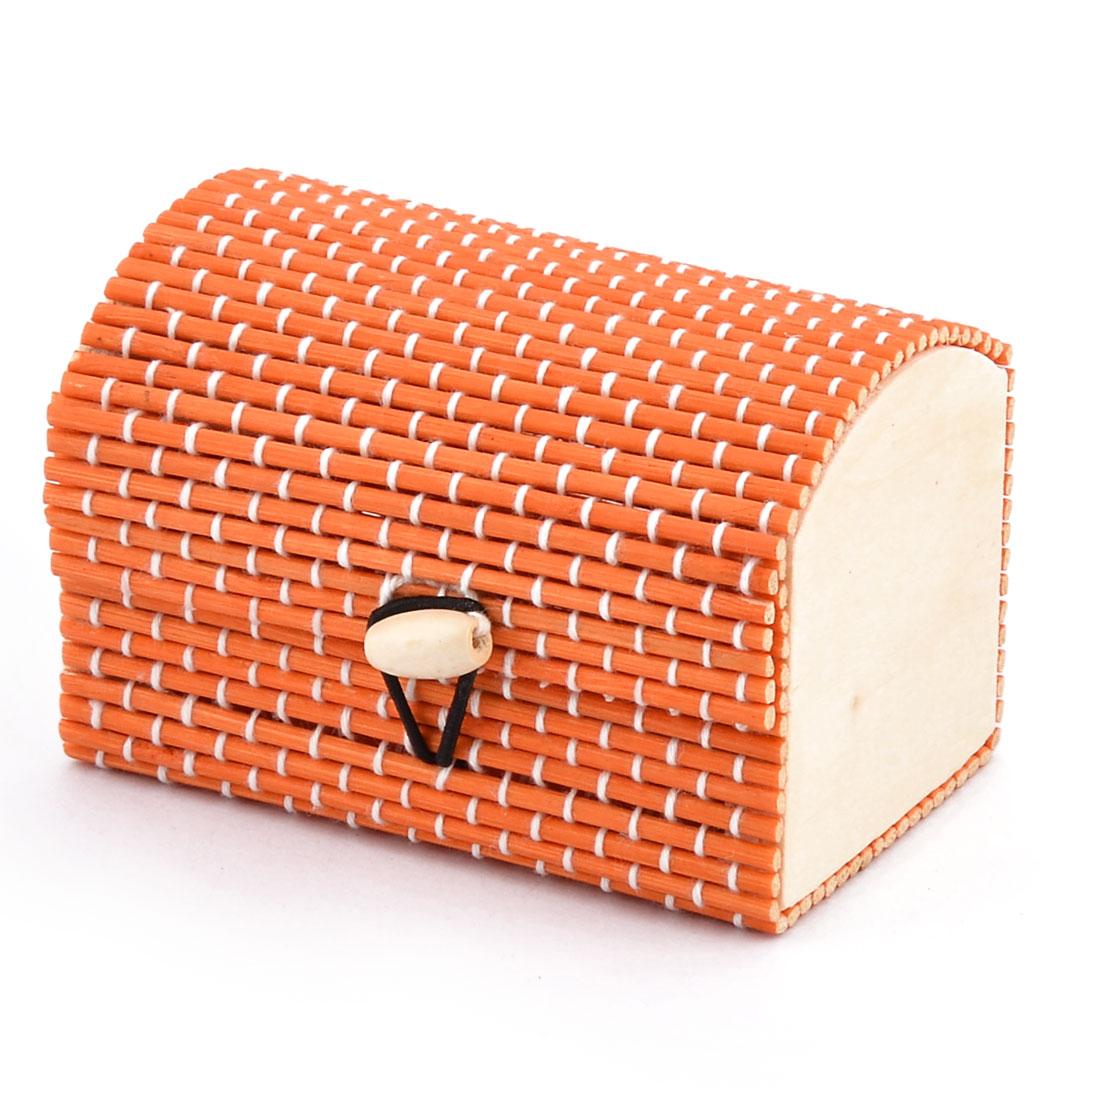 Wood Handmade Gift Storage Box Jewelry Necklace Ornament Organizer Holder Orange